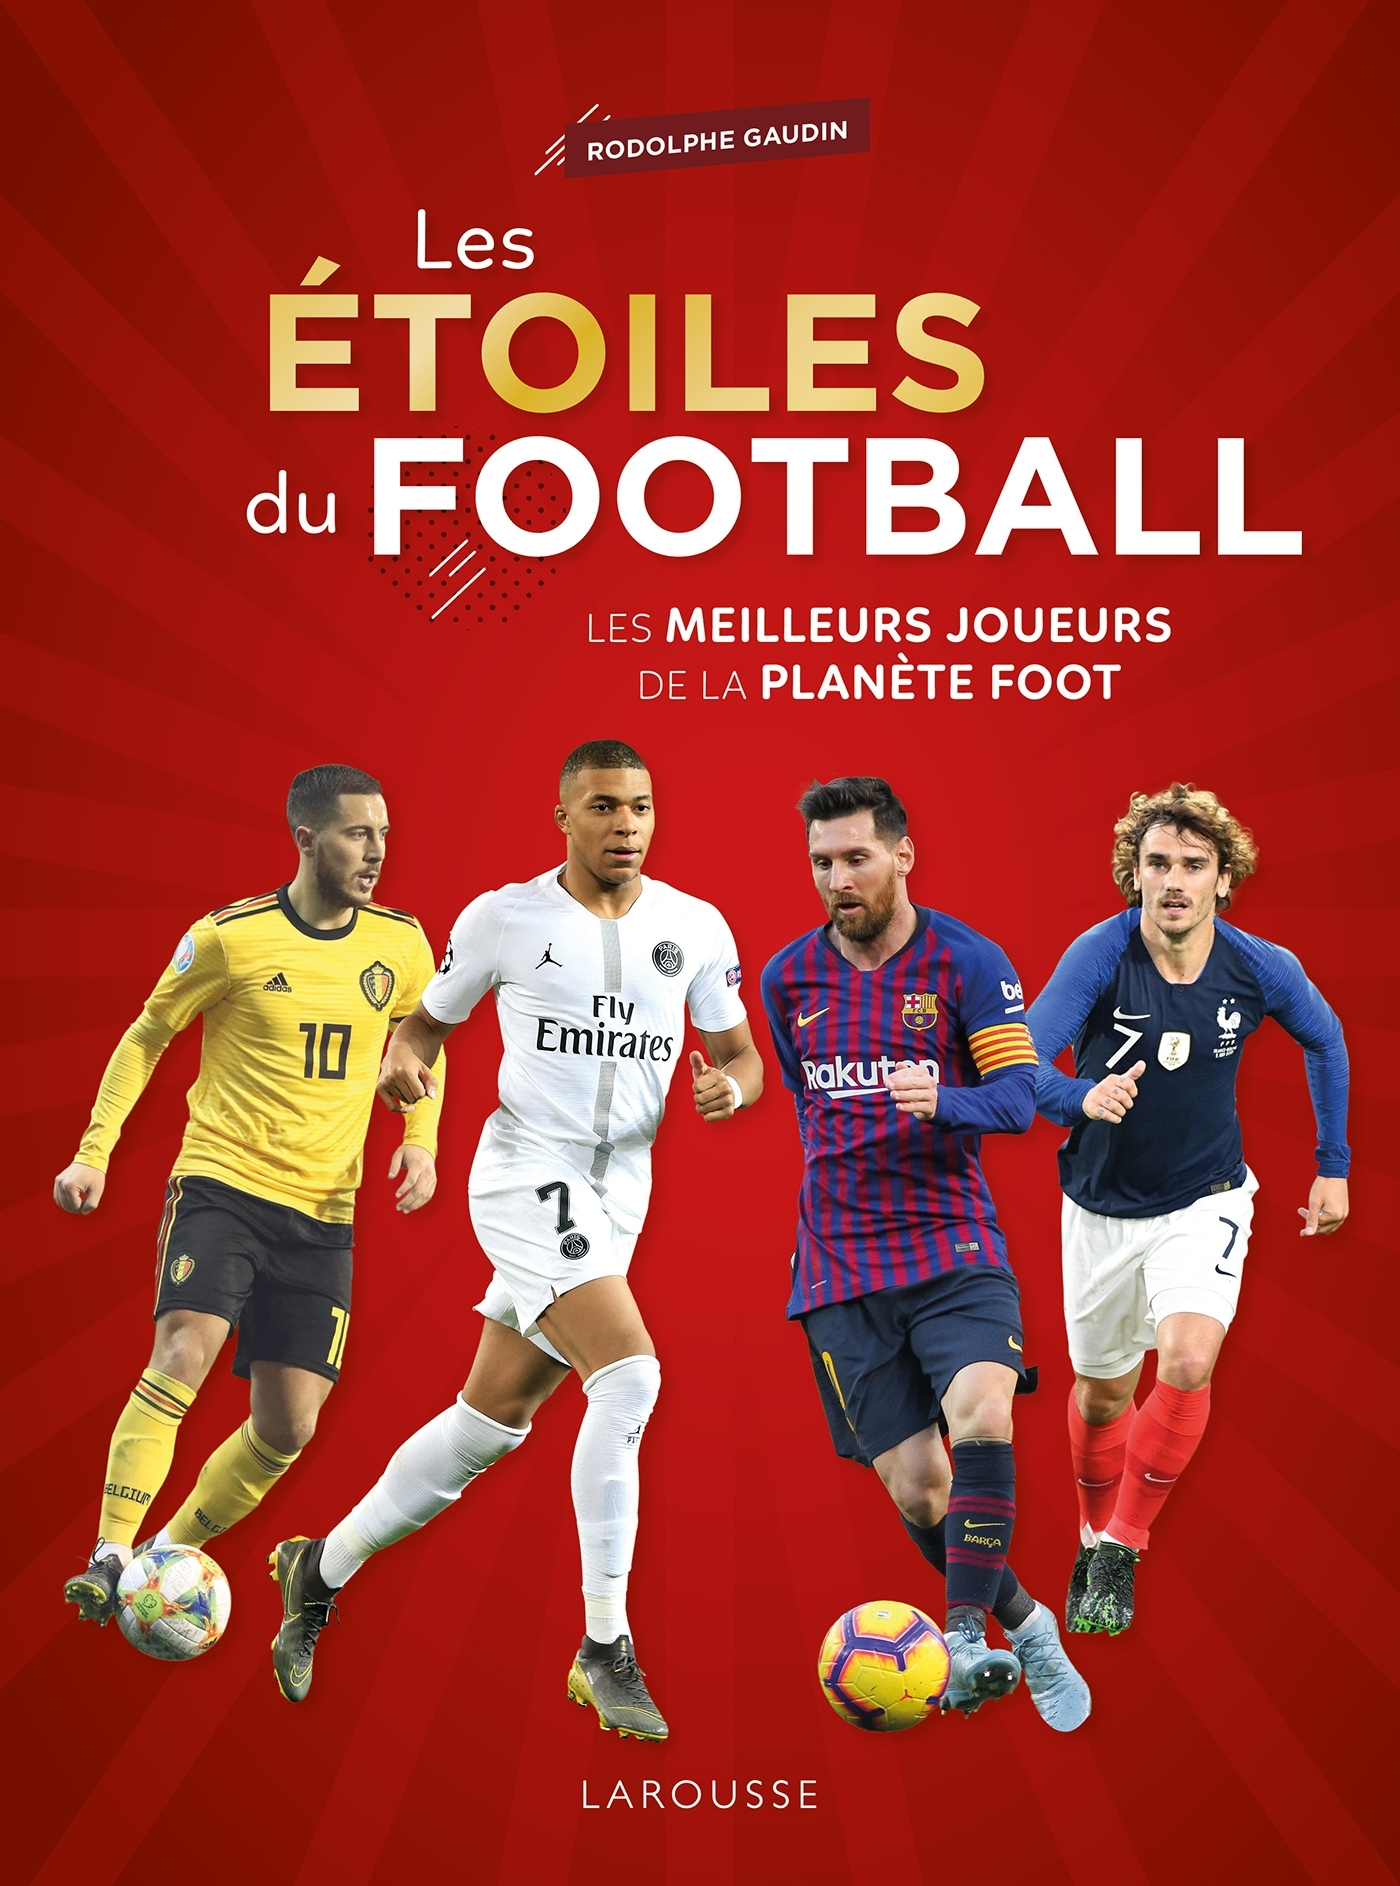 LES ETOILES DU FOOTBALL